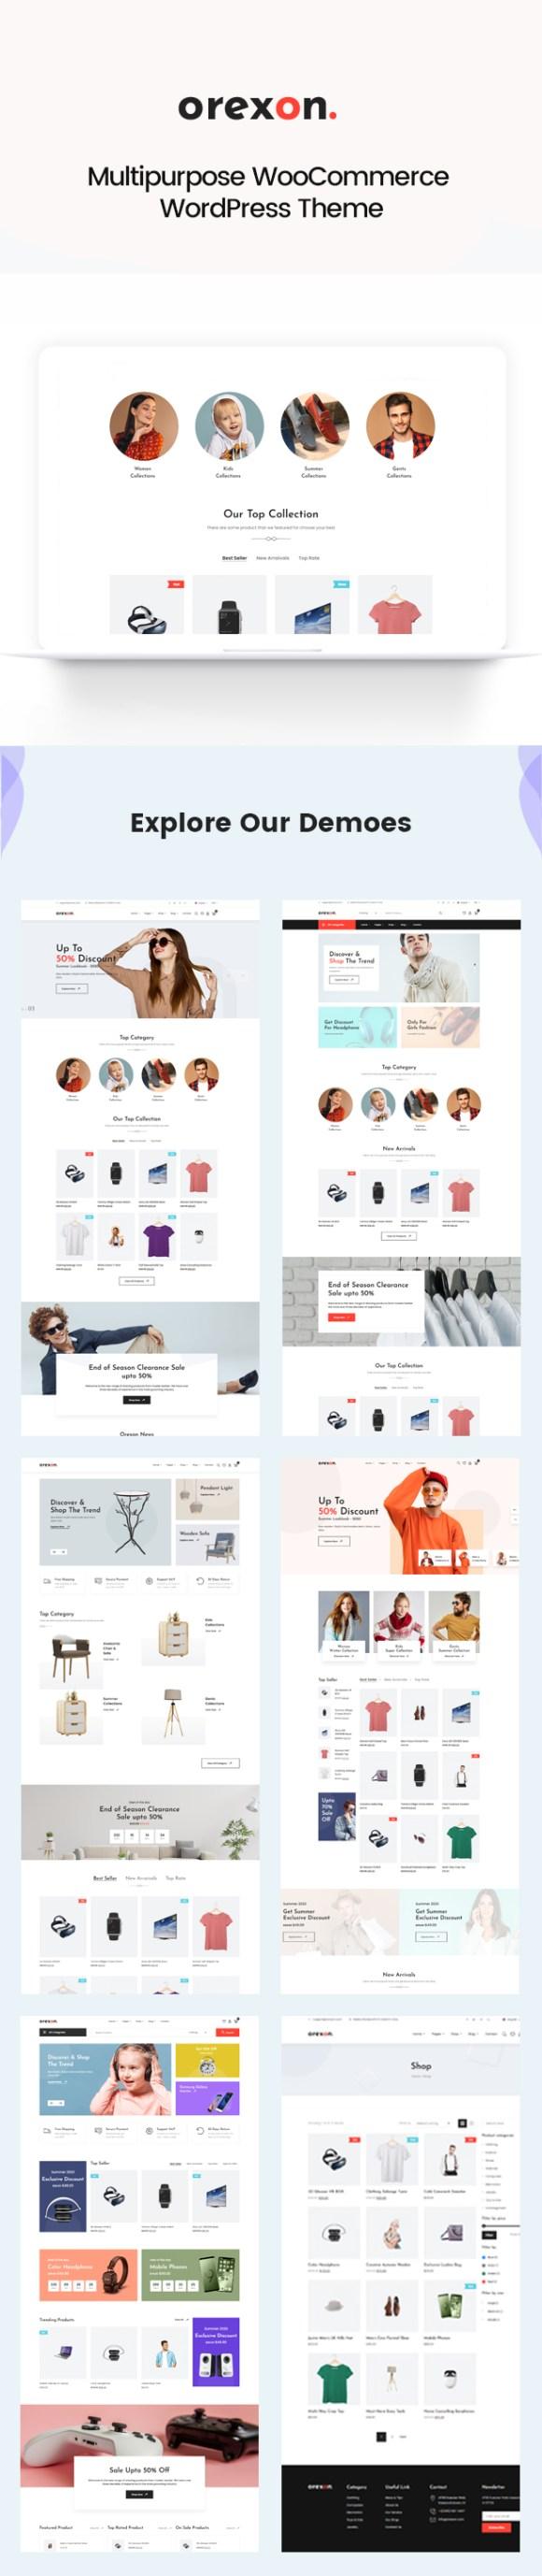 Orexon - Multipurpose WooCommerce WordPress Theme - 2